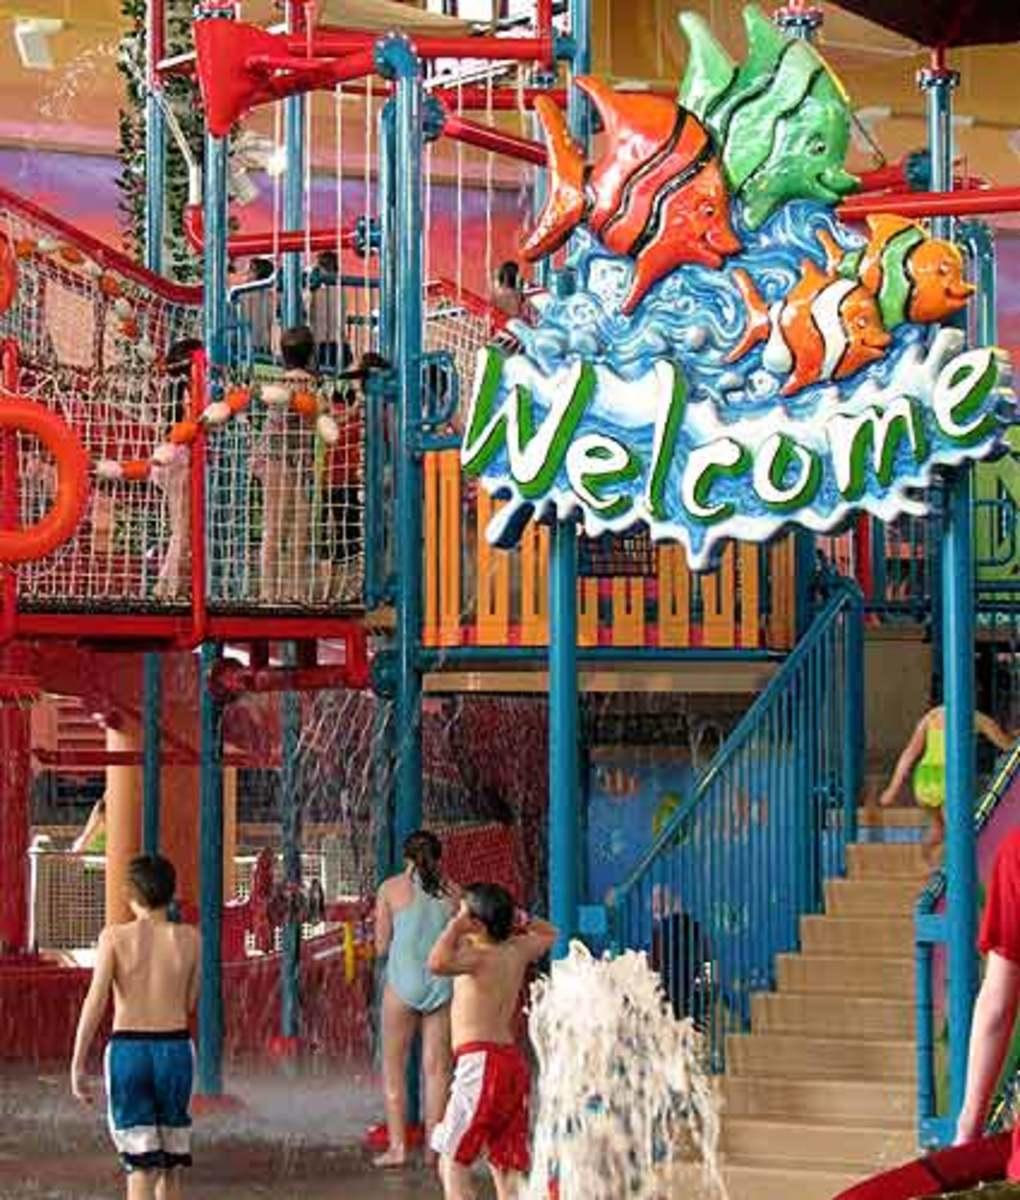 Coco Key Water Resorts have an island theme.